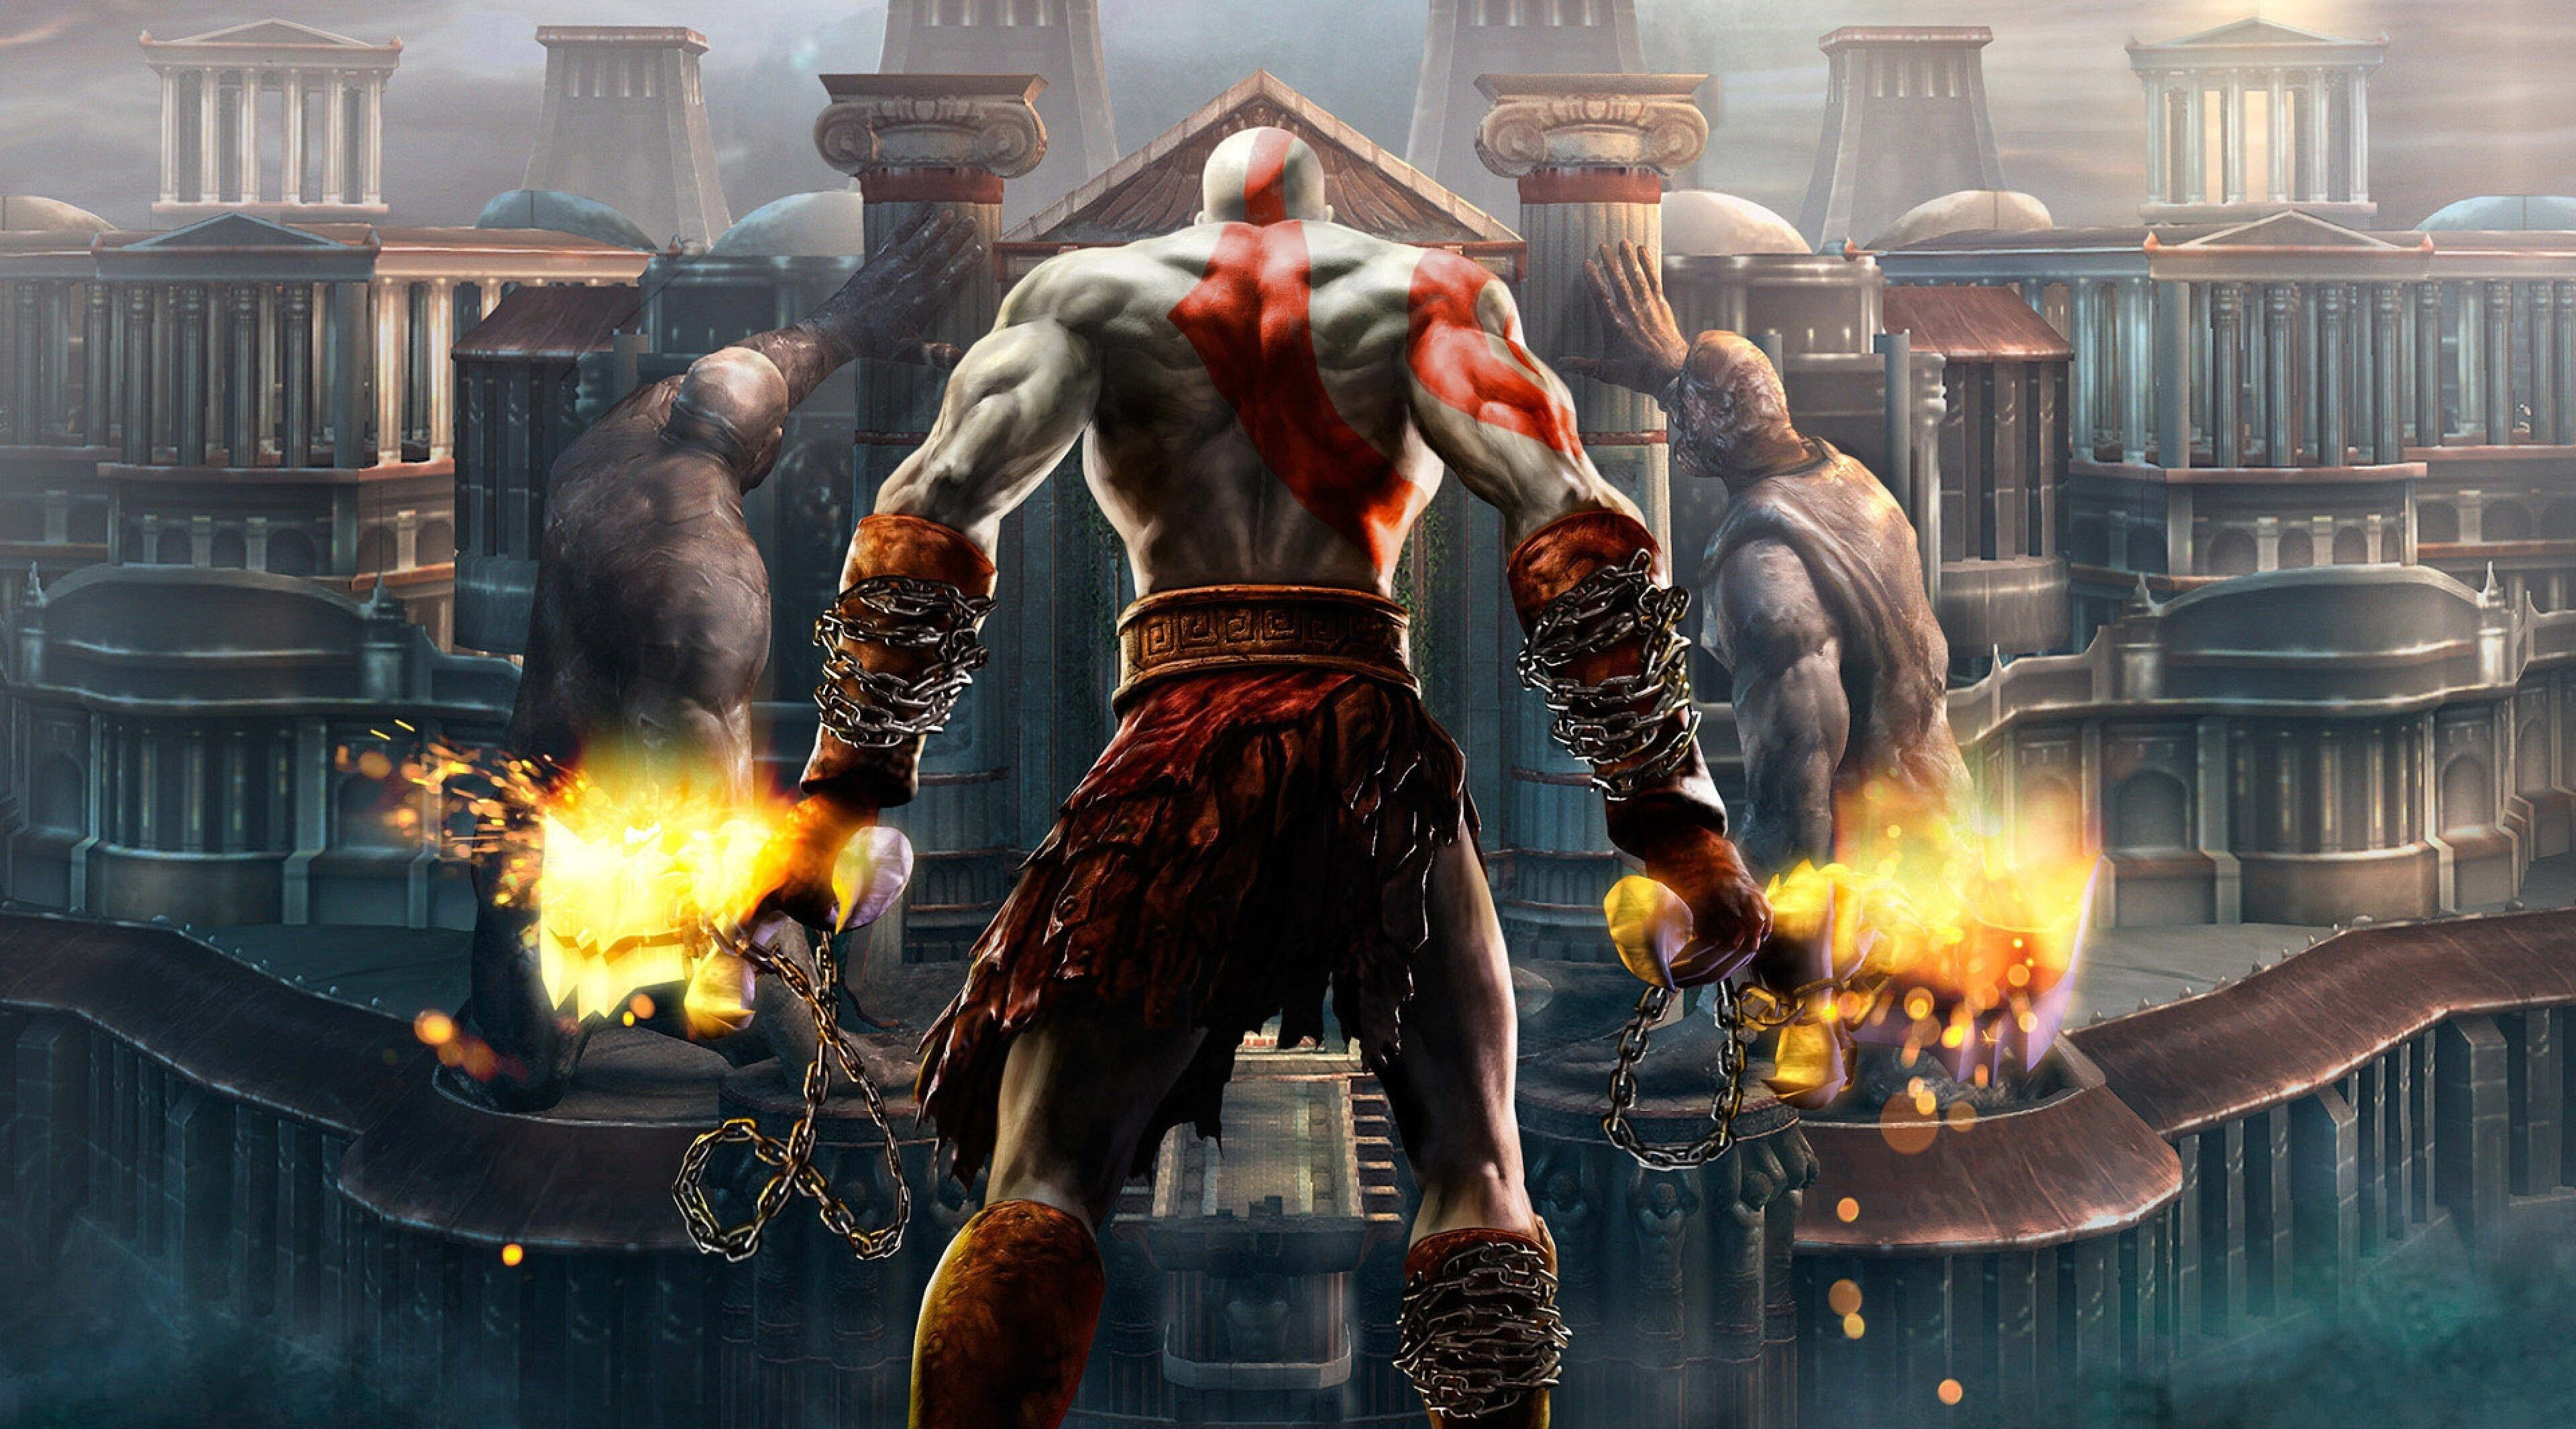 Wallpaper S Name 3840x2130 God Of War 4k Wallpaper Download Resolution 3840x2130 File Size 1963 Kb Uploaded In 2020 Kratos God Of War God Of War God Of War Series